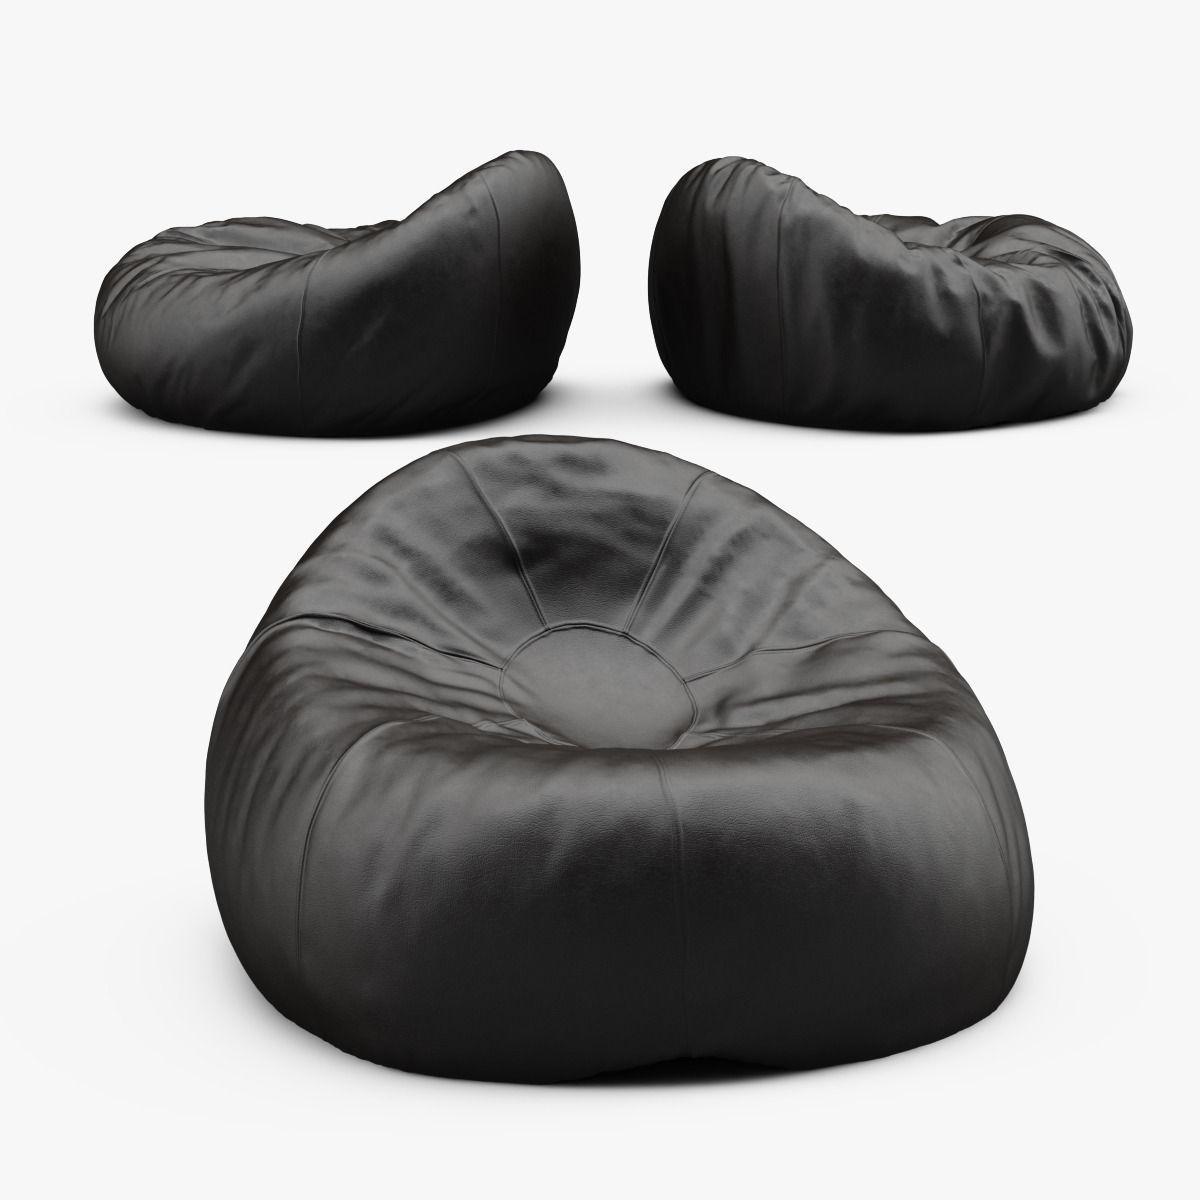 Grand Leather Bean Bag Chair 3d Model